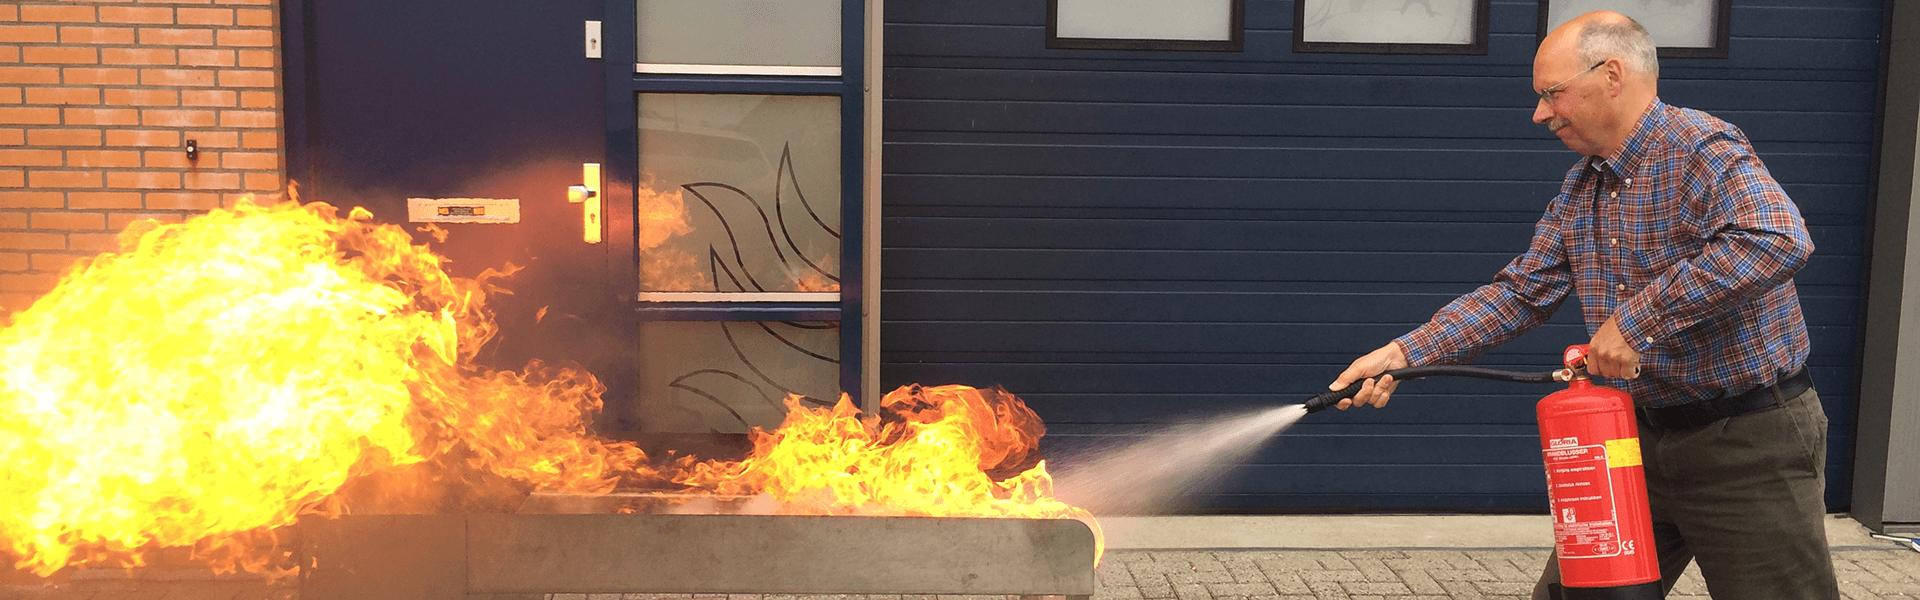 Brandbeveiliging eFBe Beveiligingen bv